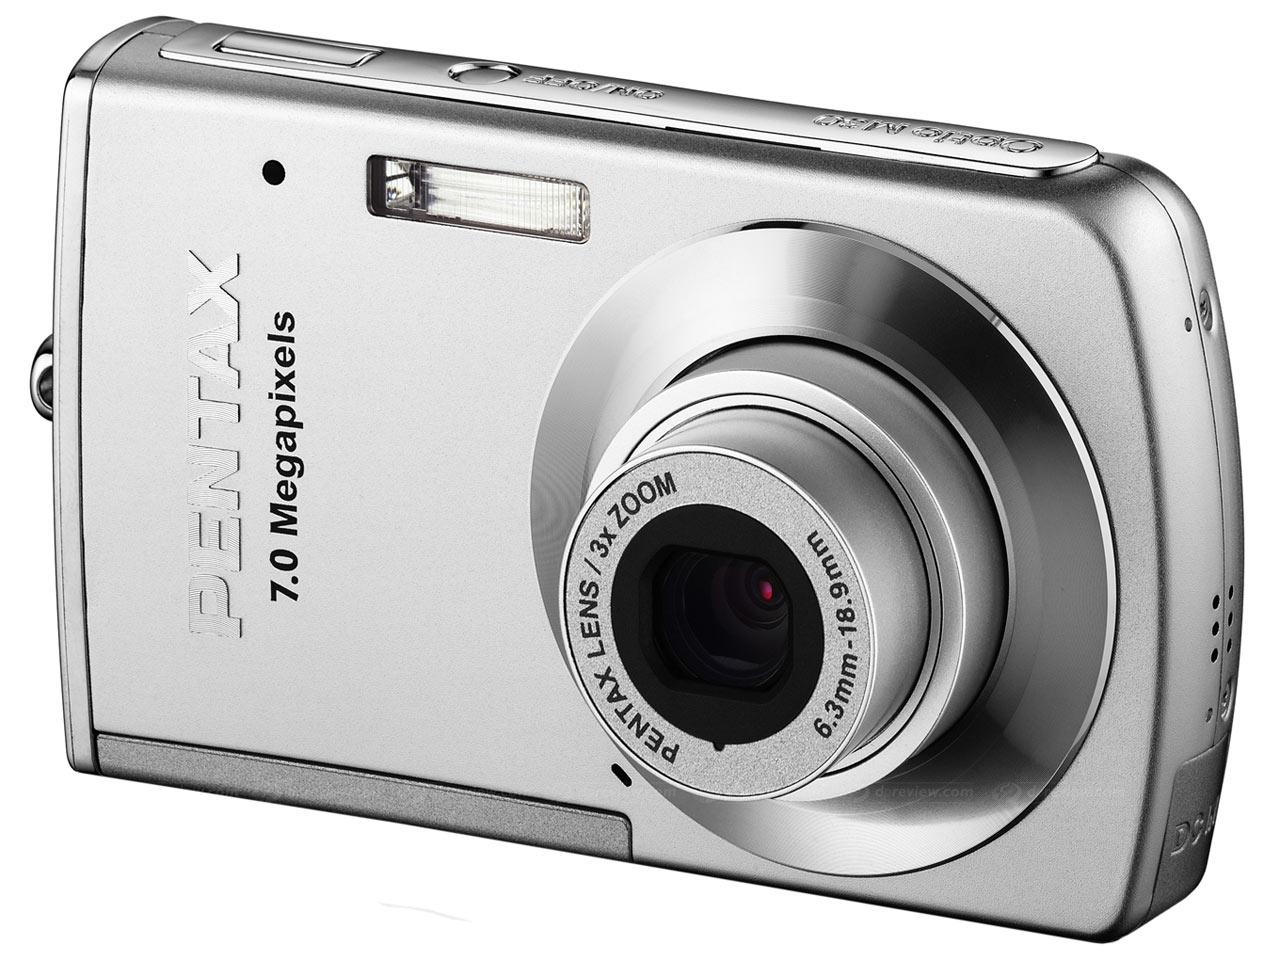 pentax optio m30 digital photography review rh dpreview com Pentax 16MP Camera Pentax 16MP Camera